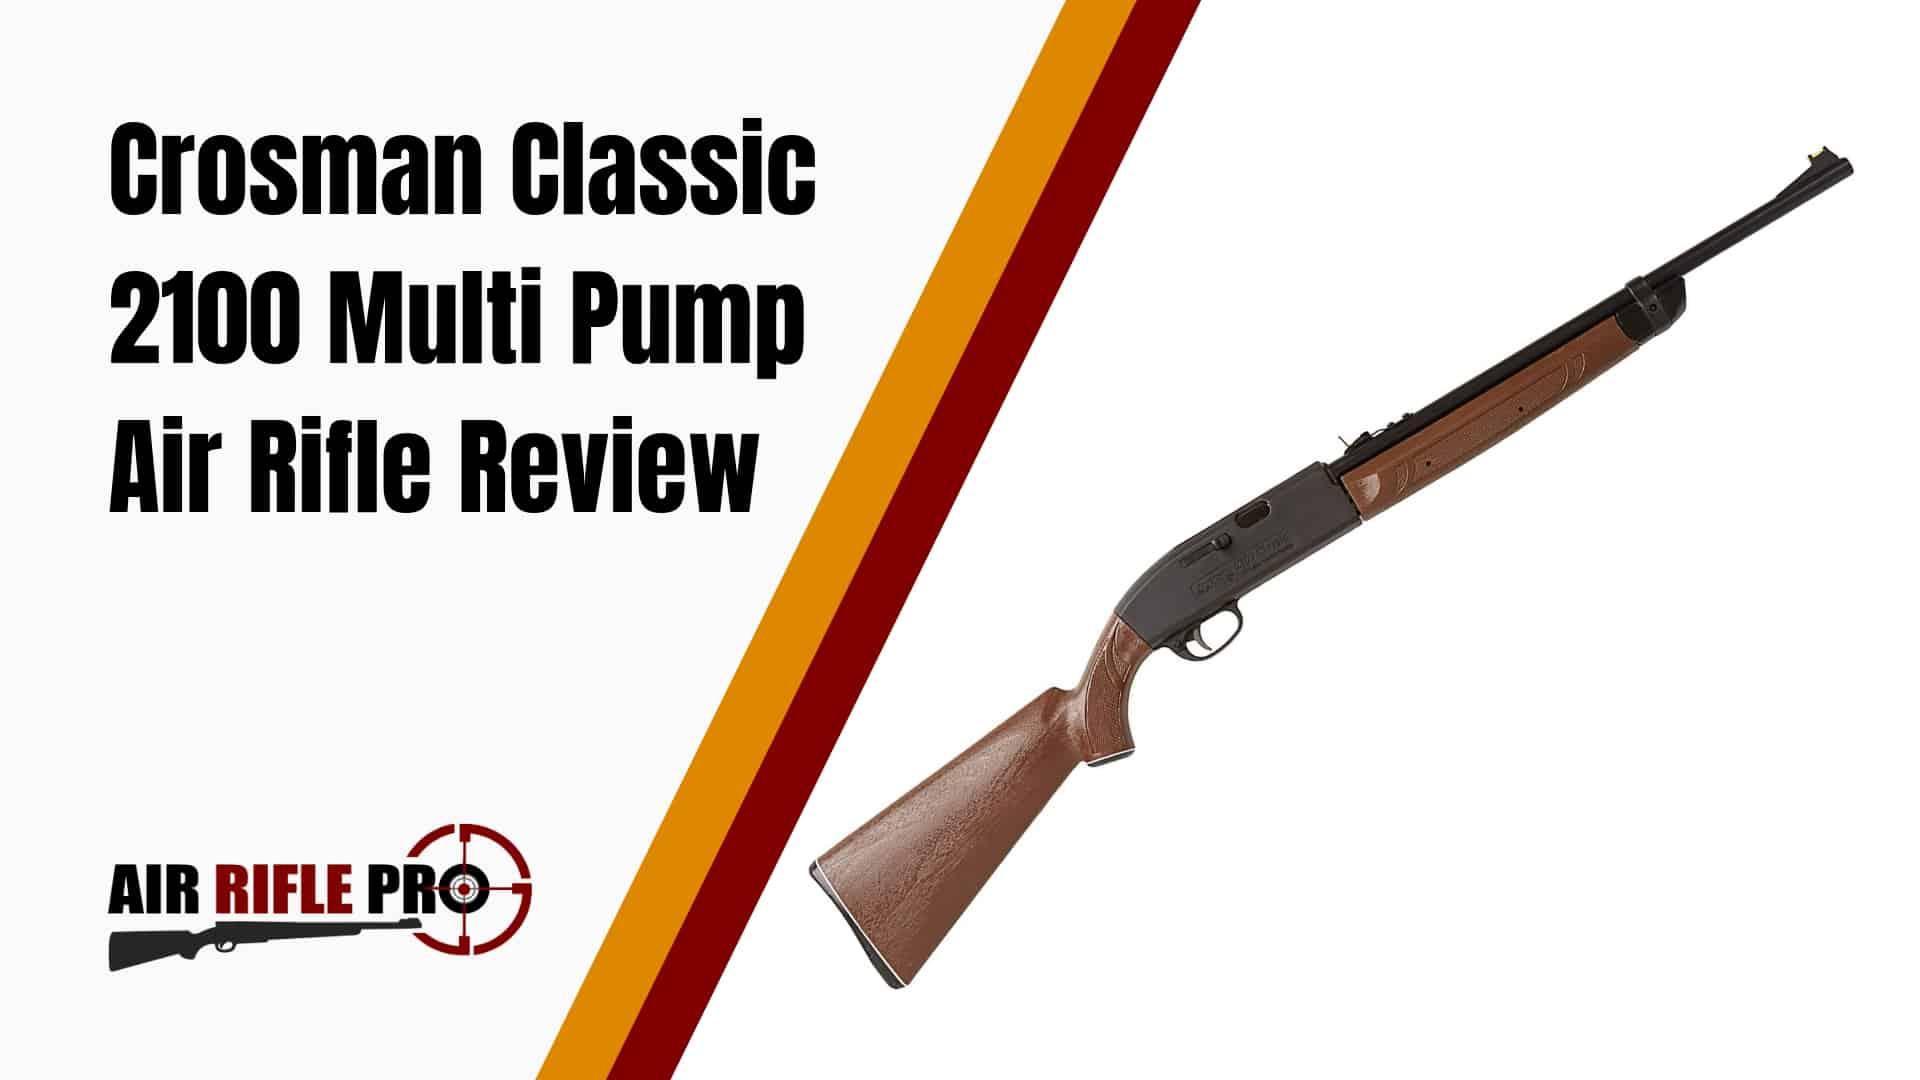 hight resolution of crosman classic 2100 177 cal multi pump air rifle review air rifle pro